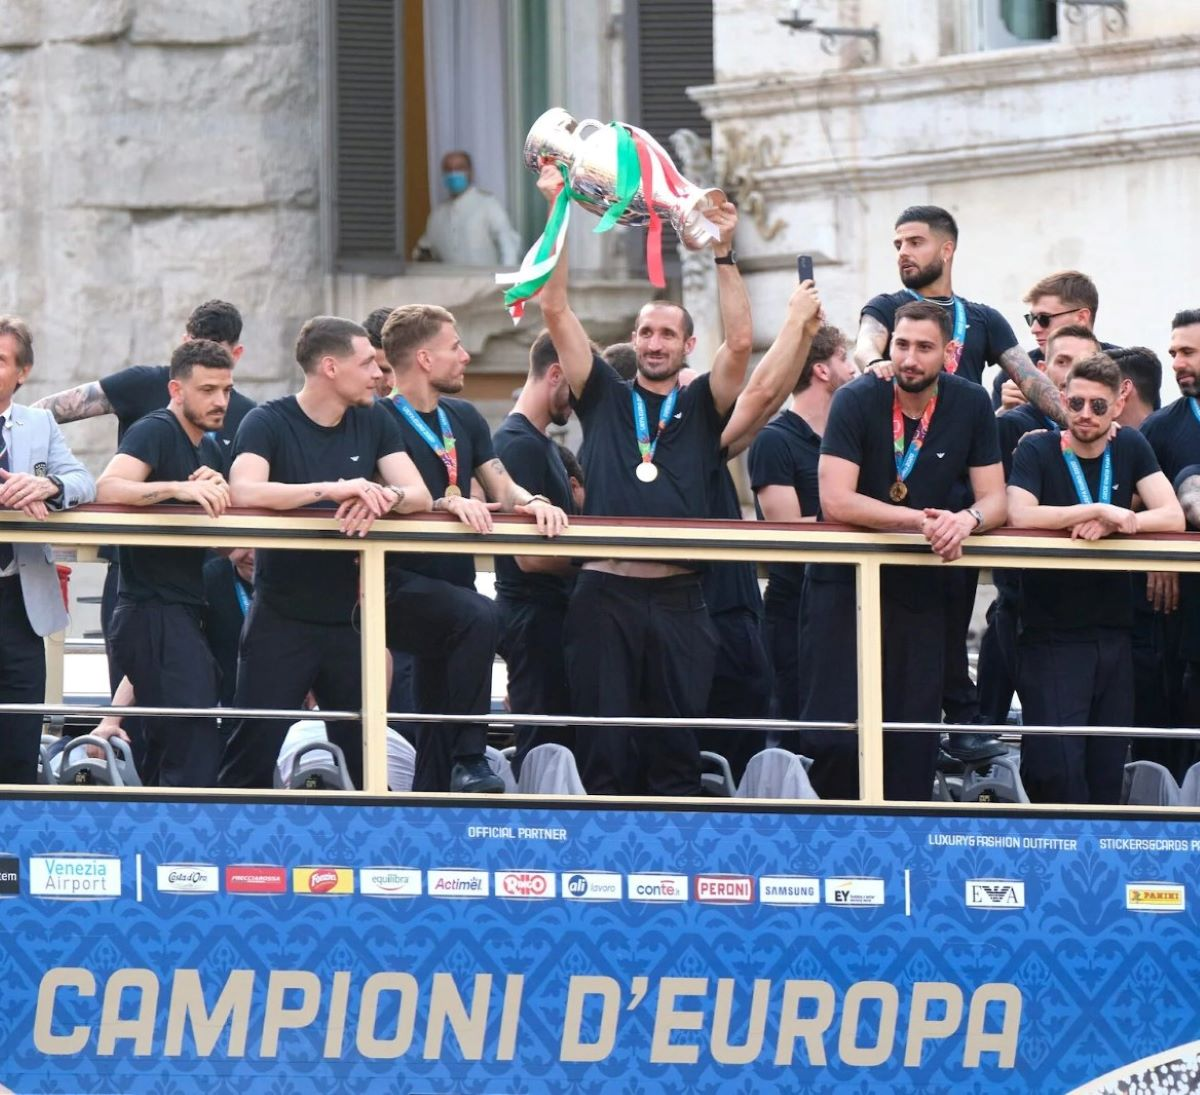 Italia Inghilterra Tifosi Inglesi Raccolta Fondi Acquisto Coppa Europei